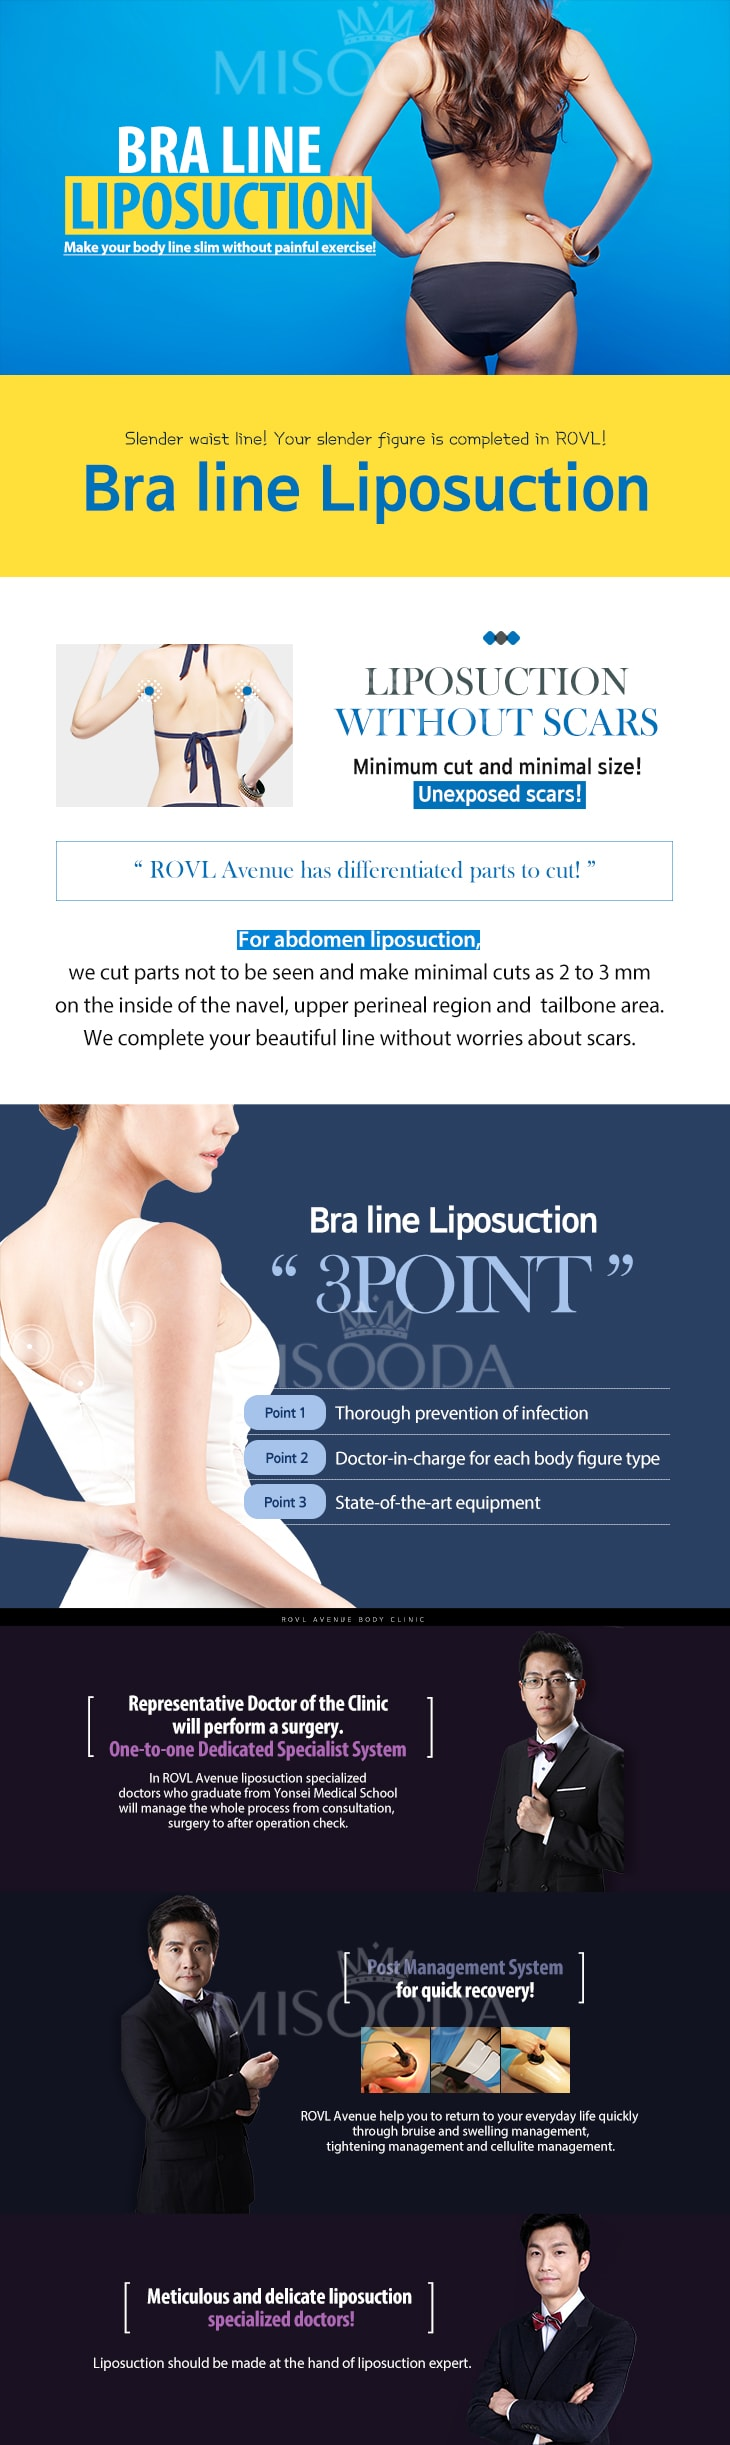 Bra Line Liposuction